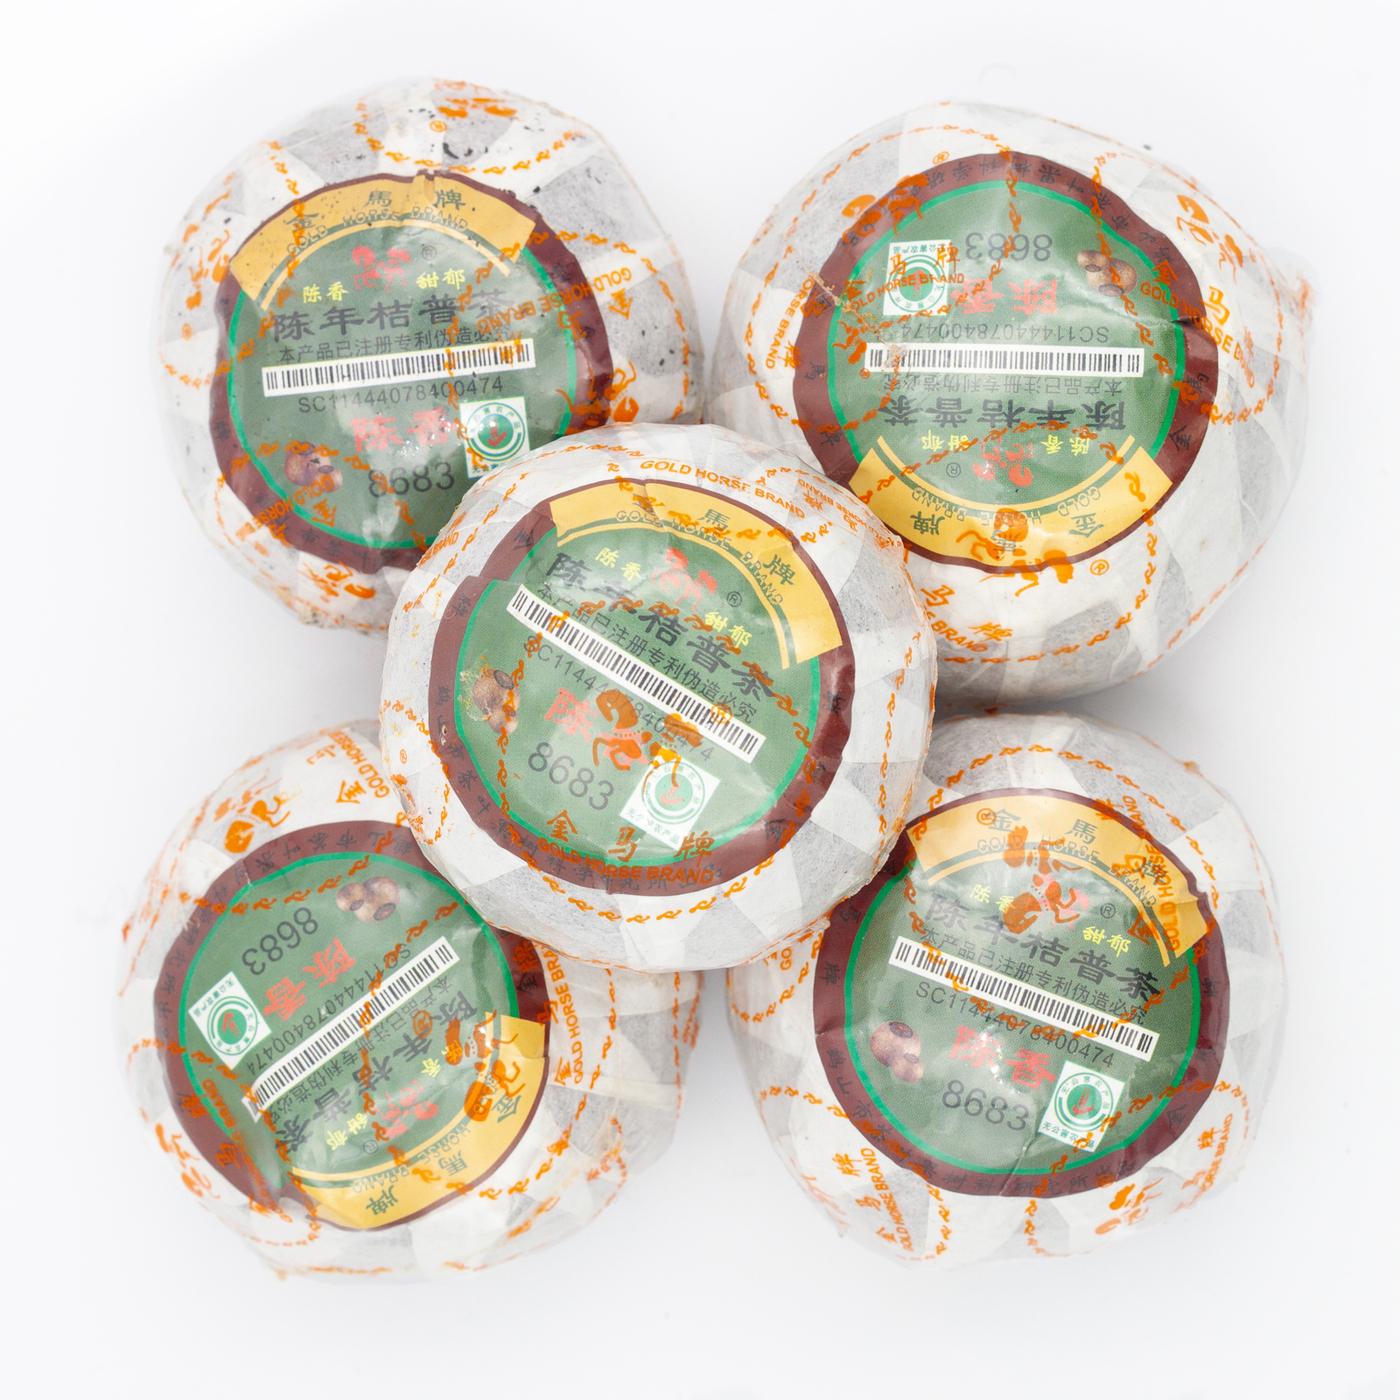 Шу Пуэр в большом мандарине, Белая Обезьяна, 5шт.